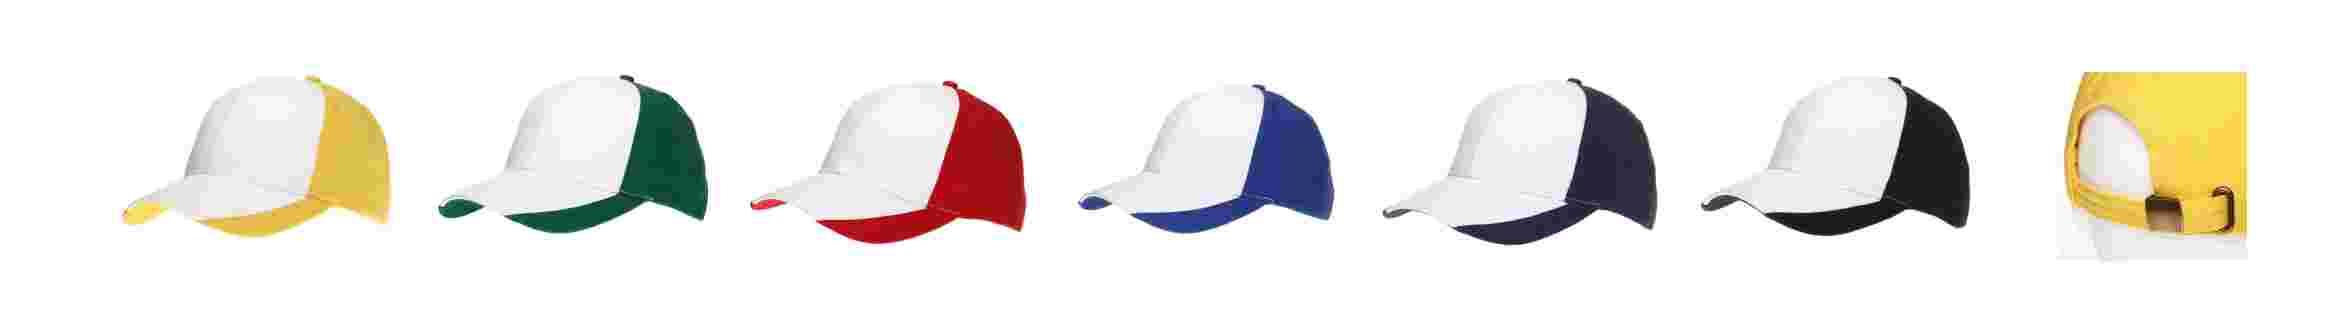 shapku-z-logotipom_lutsk